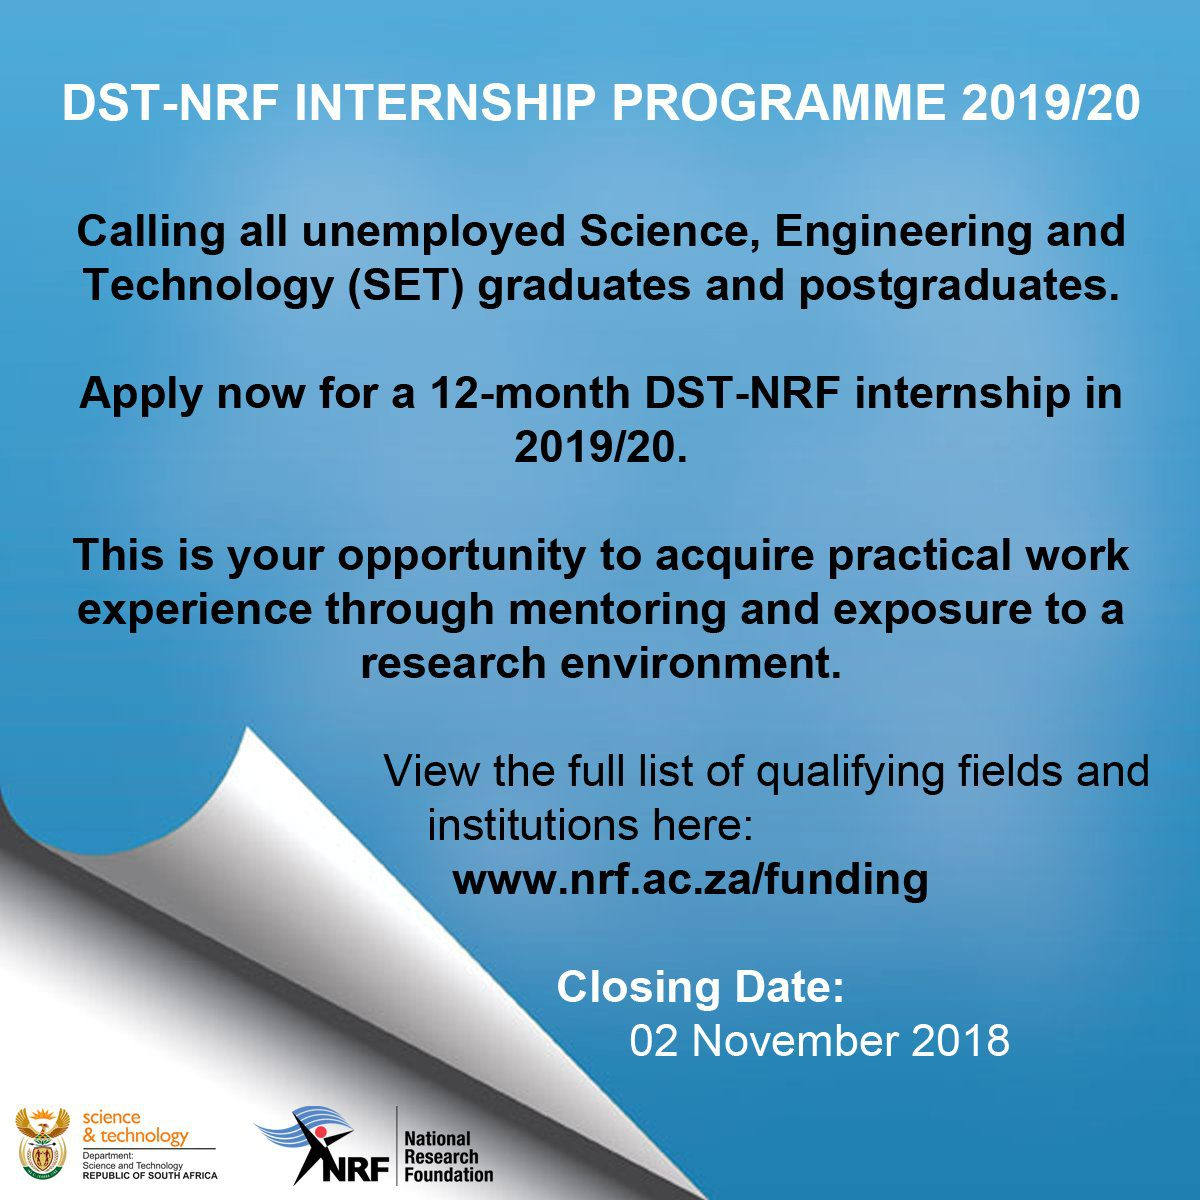 Cancel internship in 2019 83